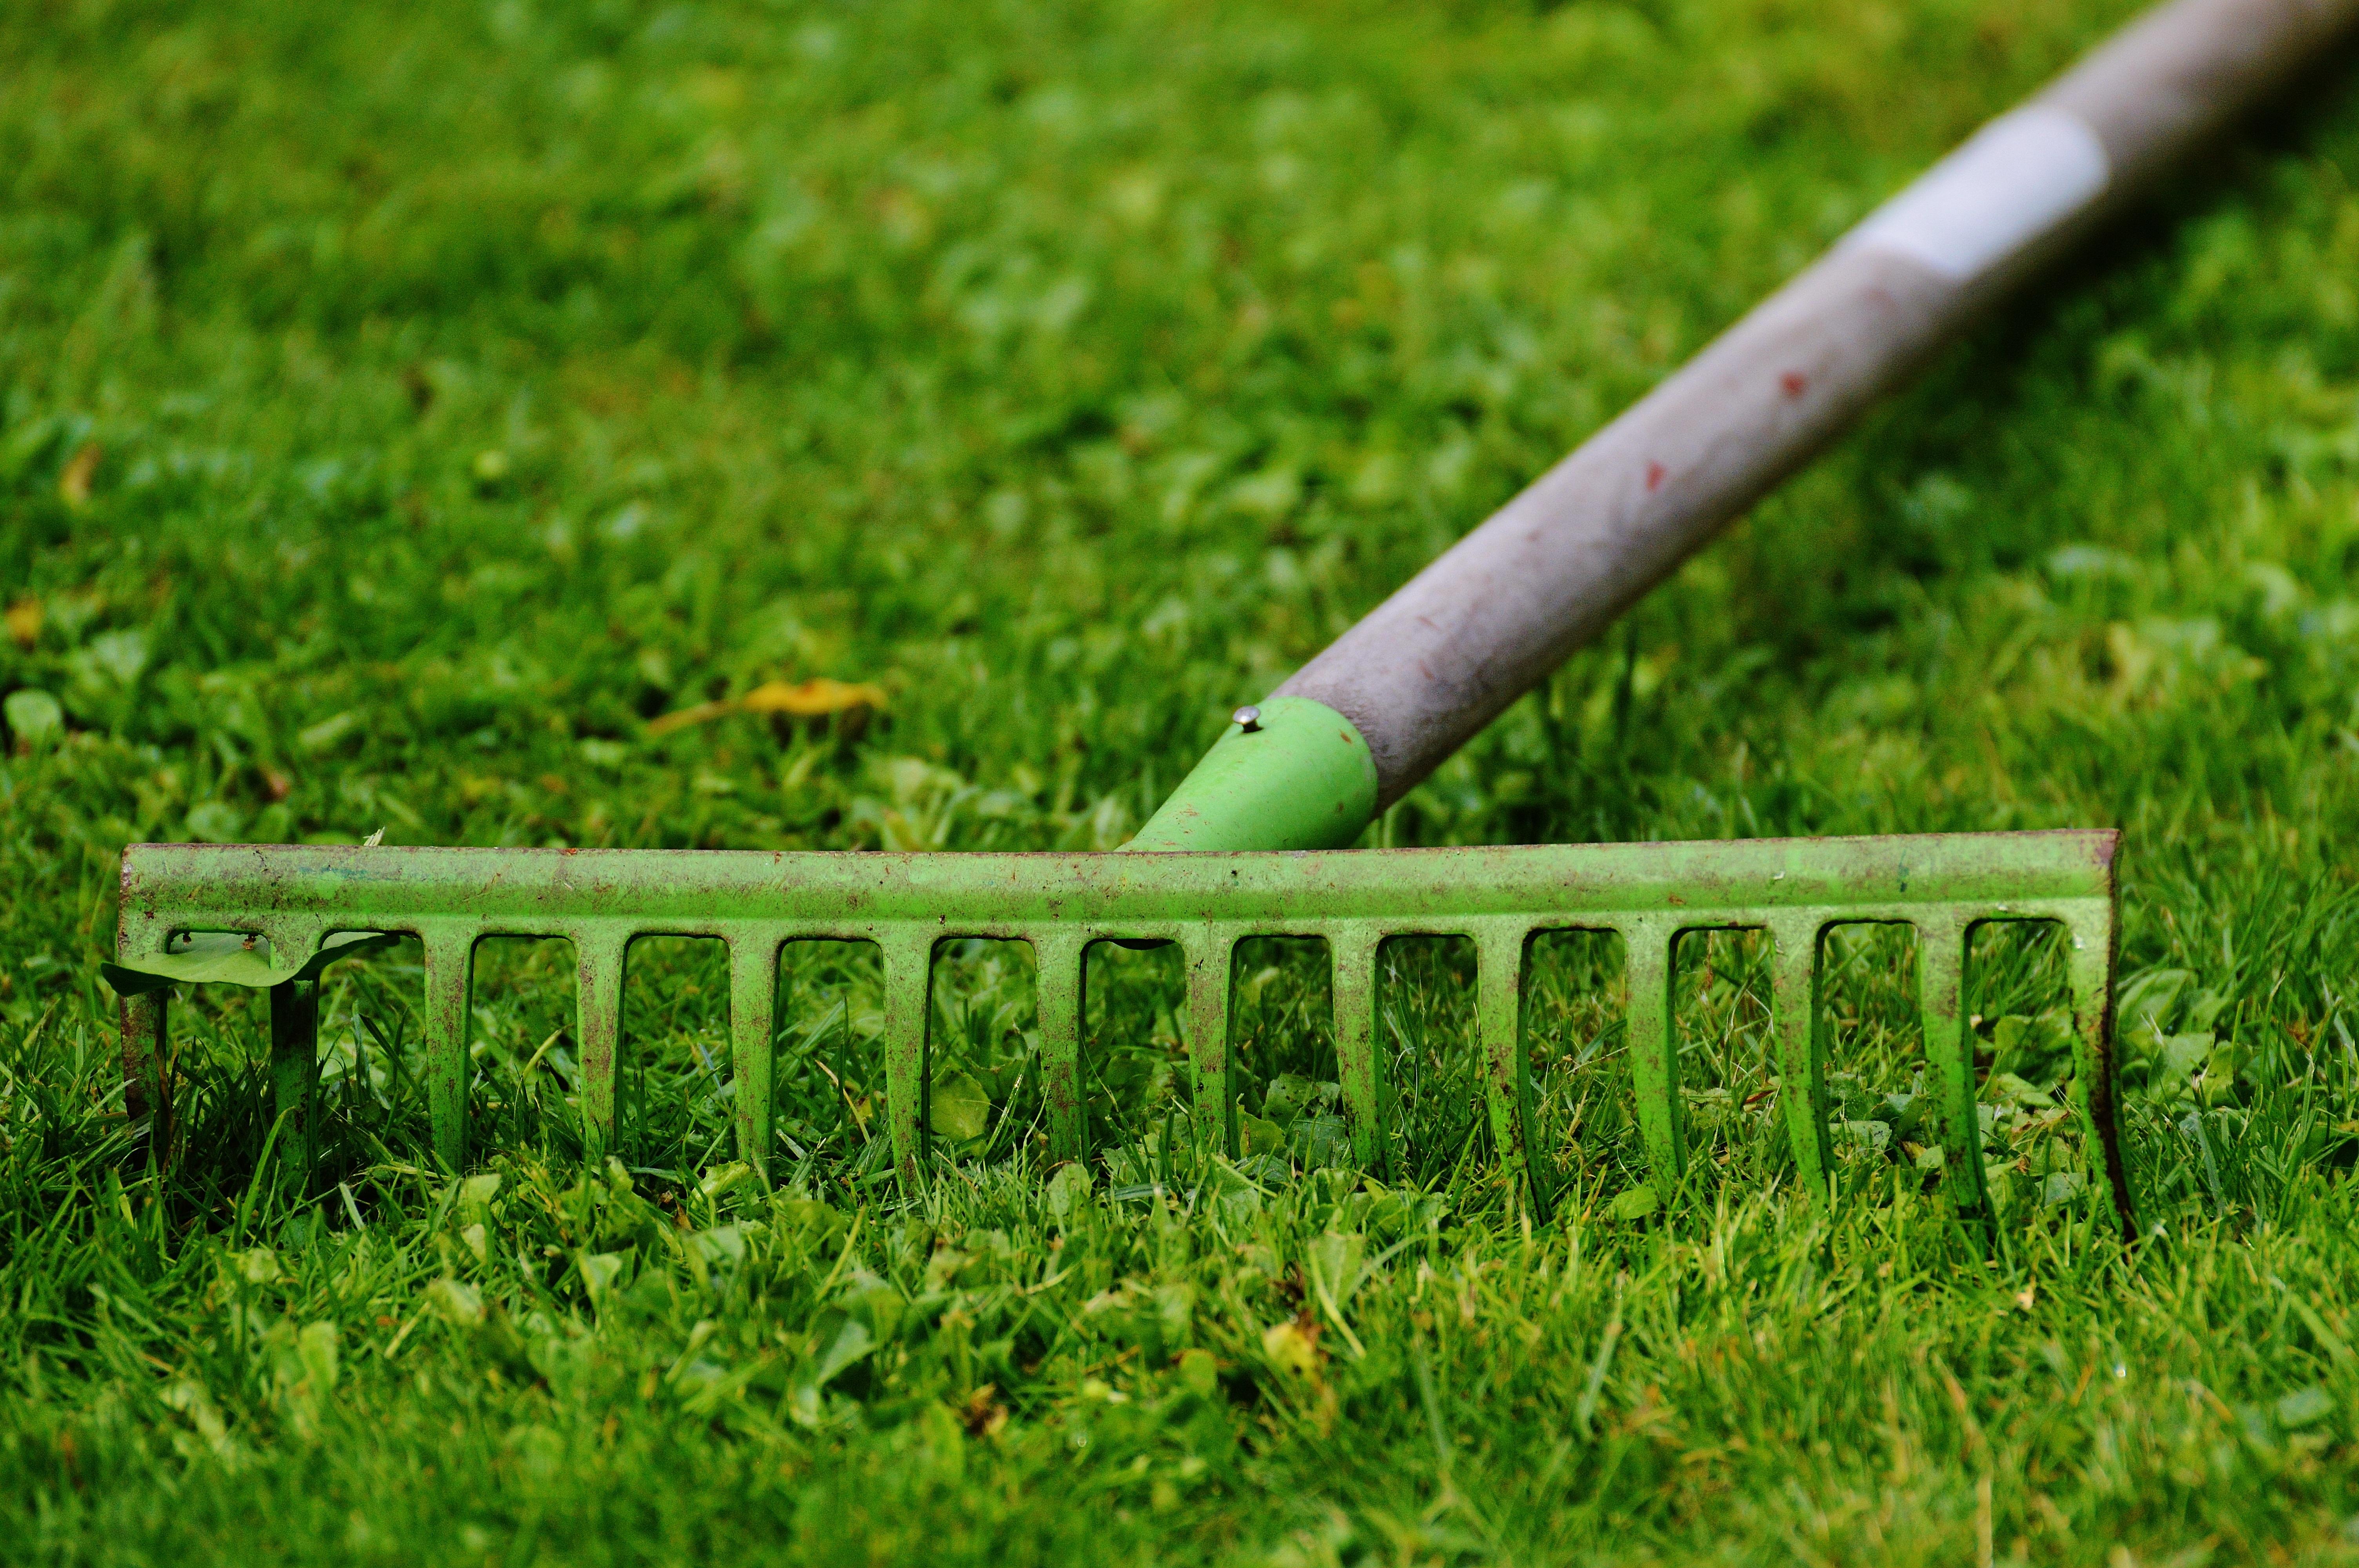 Fotos gratis : trabajo, naturaleza, césped, planta, campo, prado ...